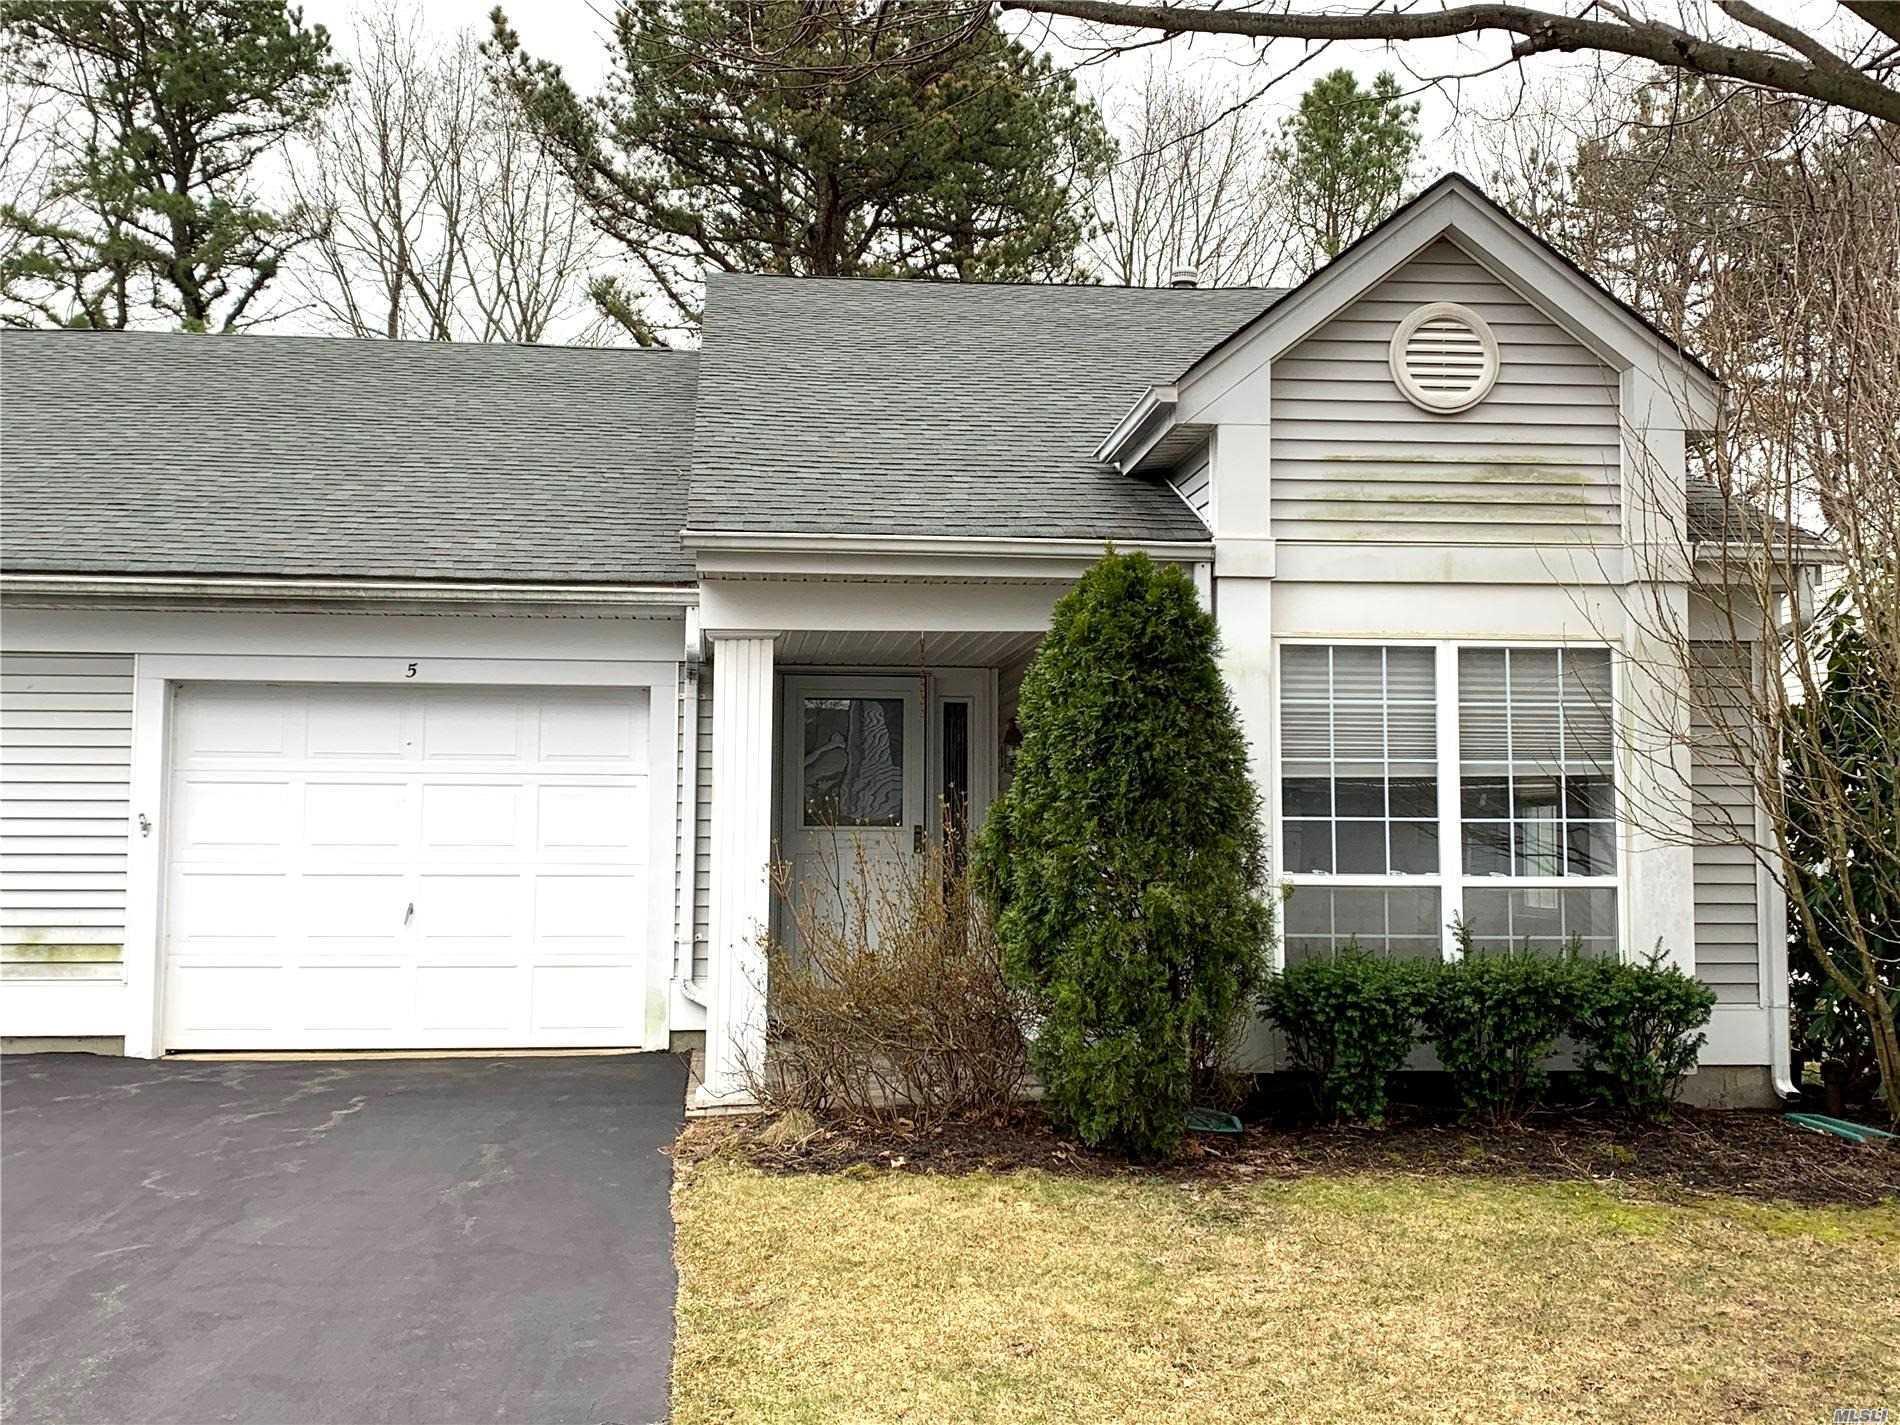 Property for sale at 5 Brookville Court, Ridge NY 11961, Ridge,  New York 11961